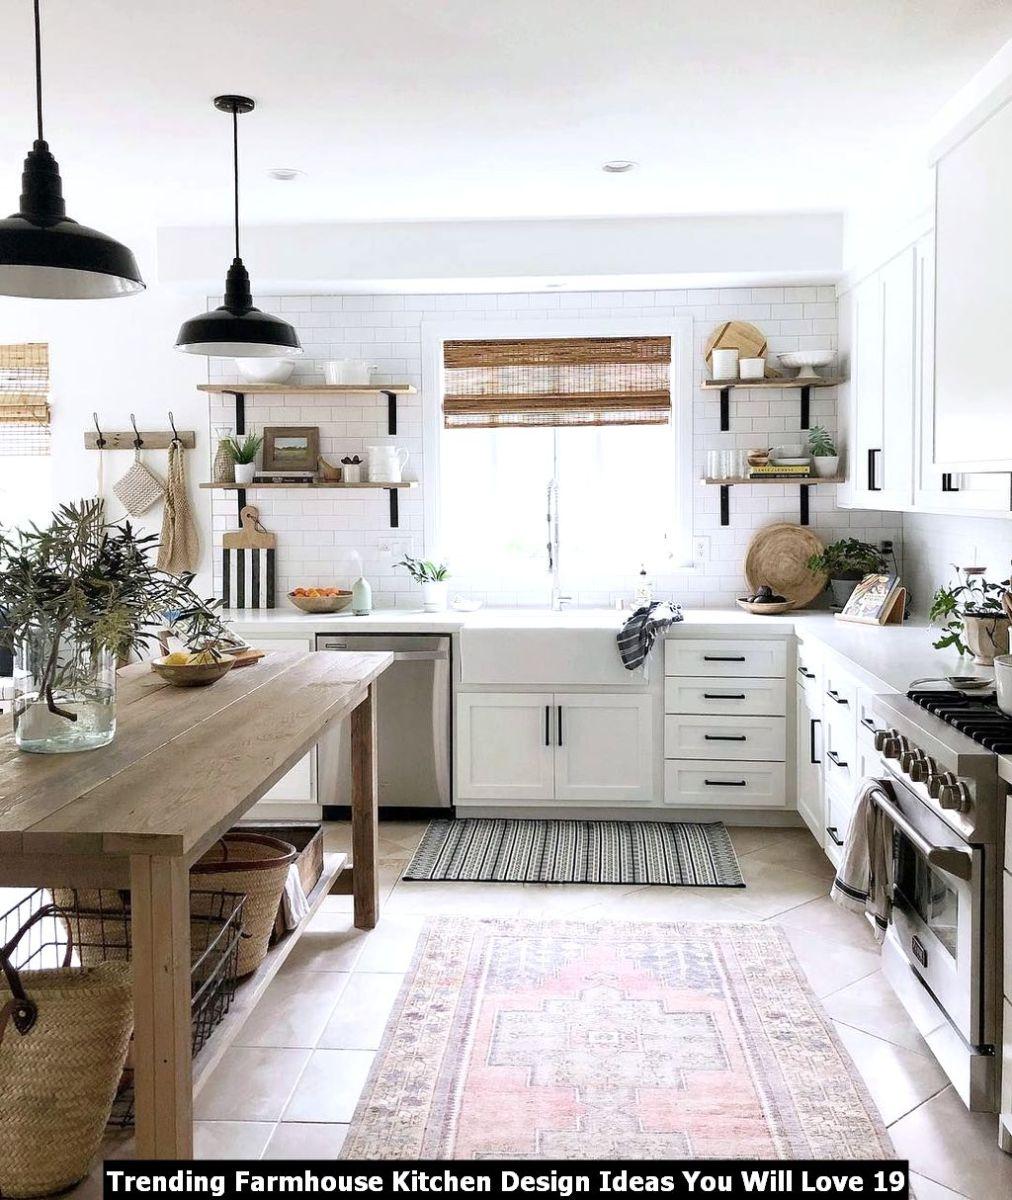 Trending Farmhouse Kitchen Design Ideas You Will Love 19